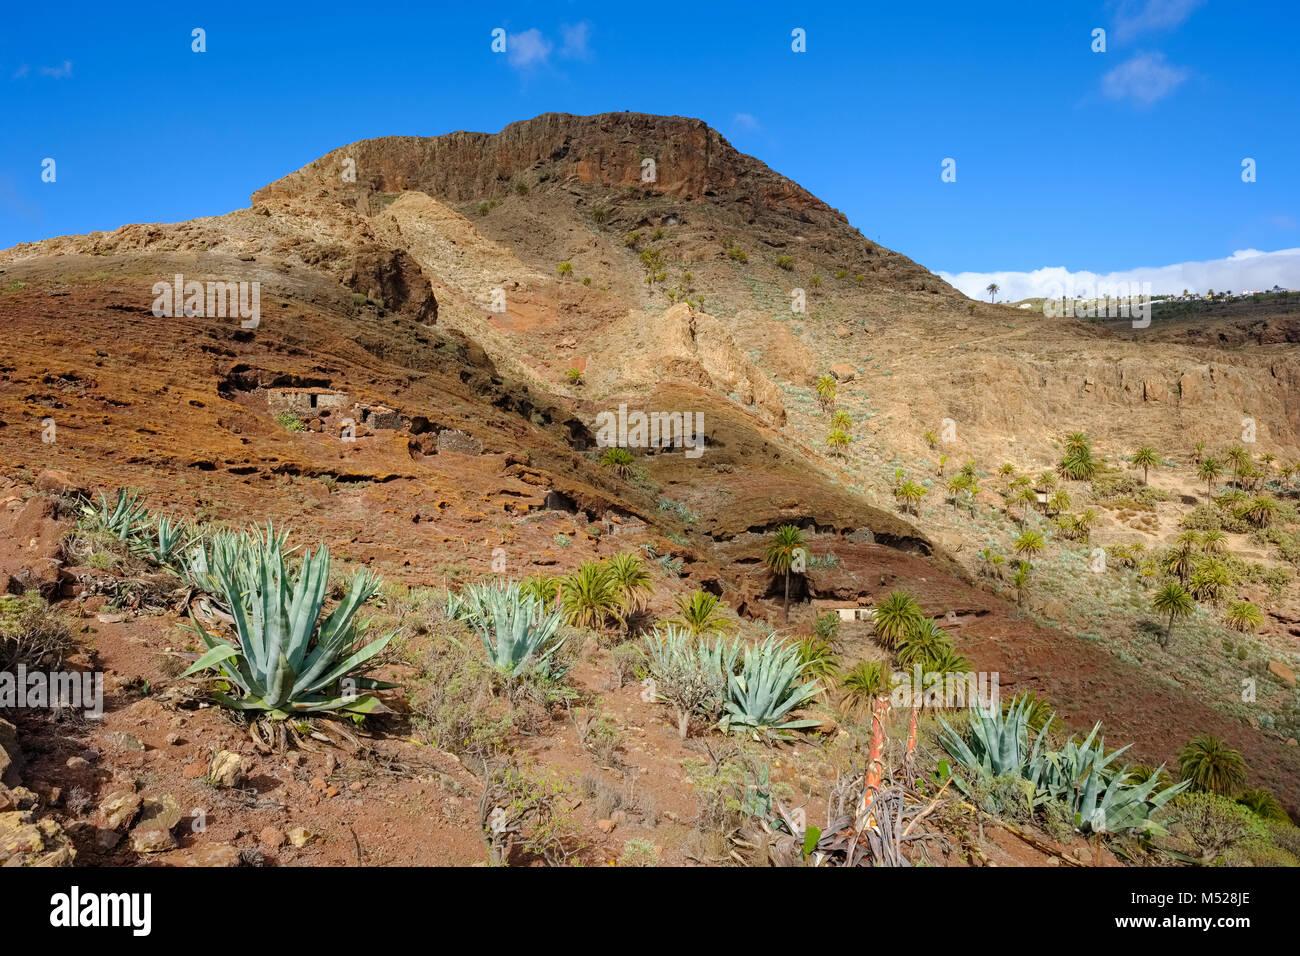 Ancient cave dwelling on Calvario Mountain,Alajero,La Gomera,Canary Islands,Spain - Stock Image